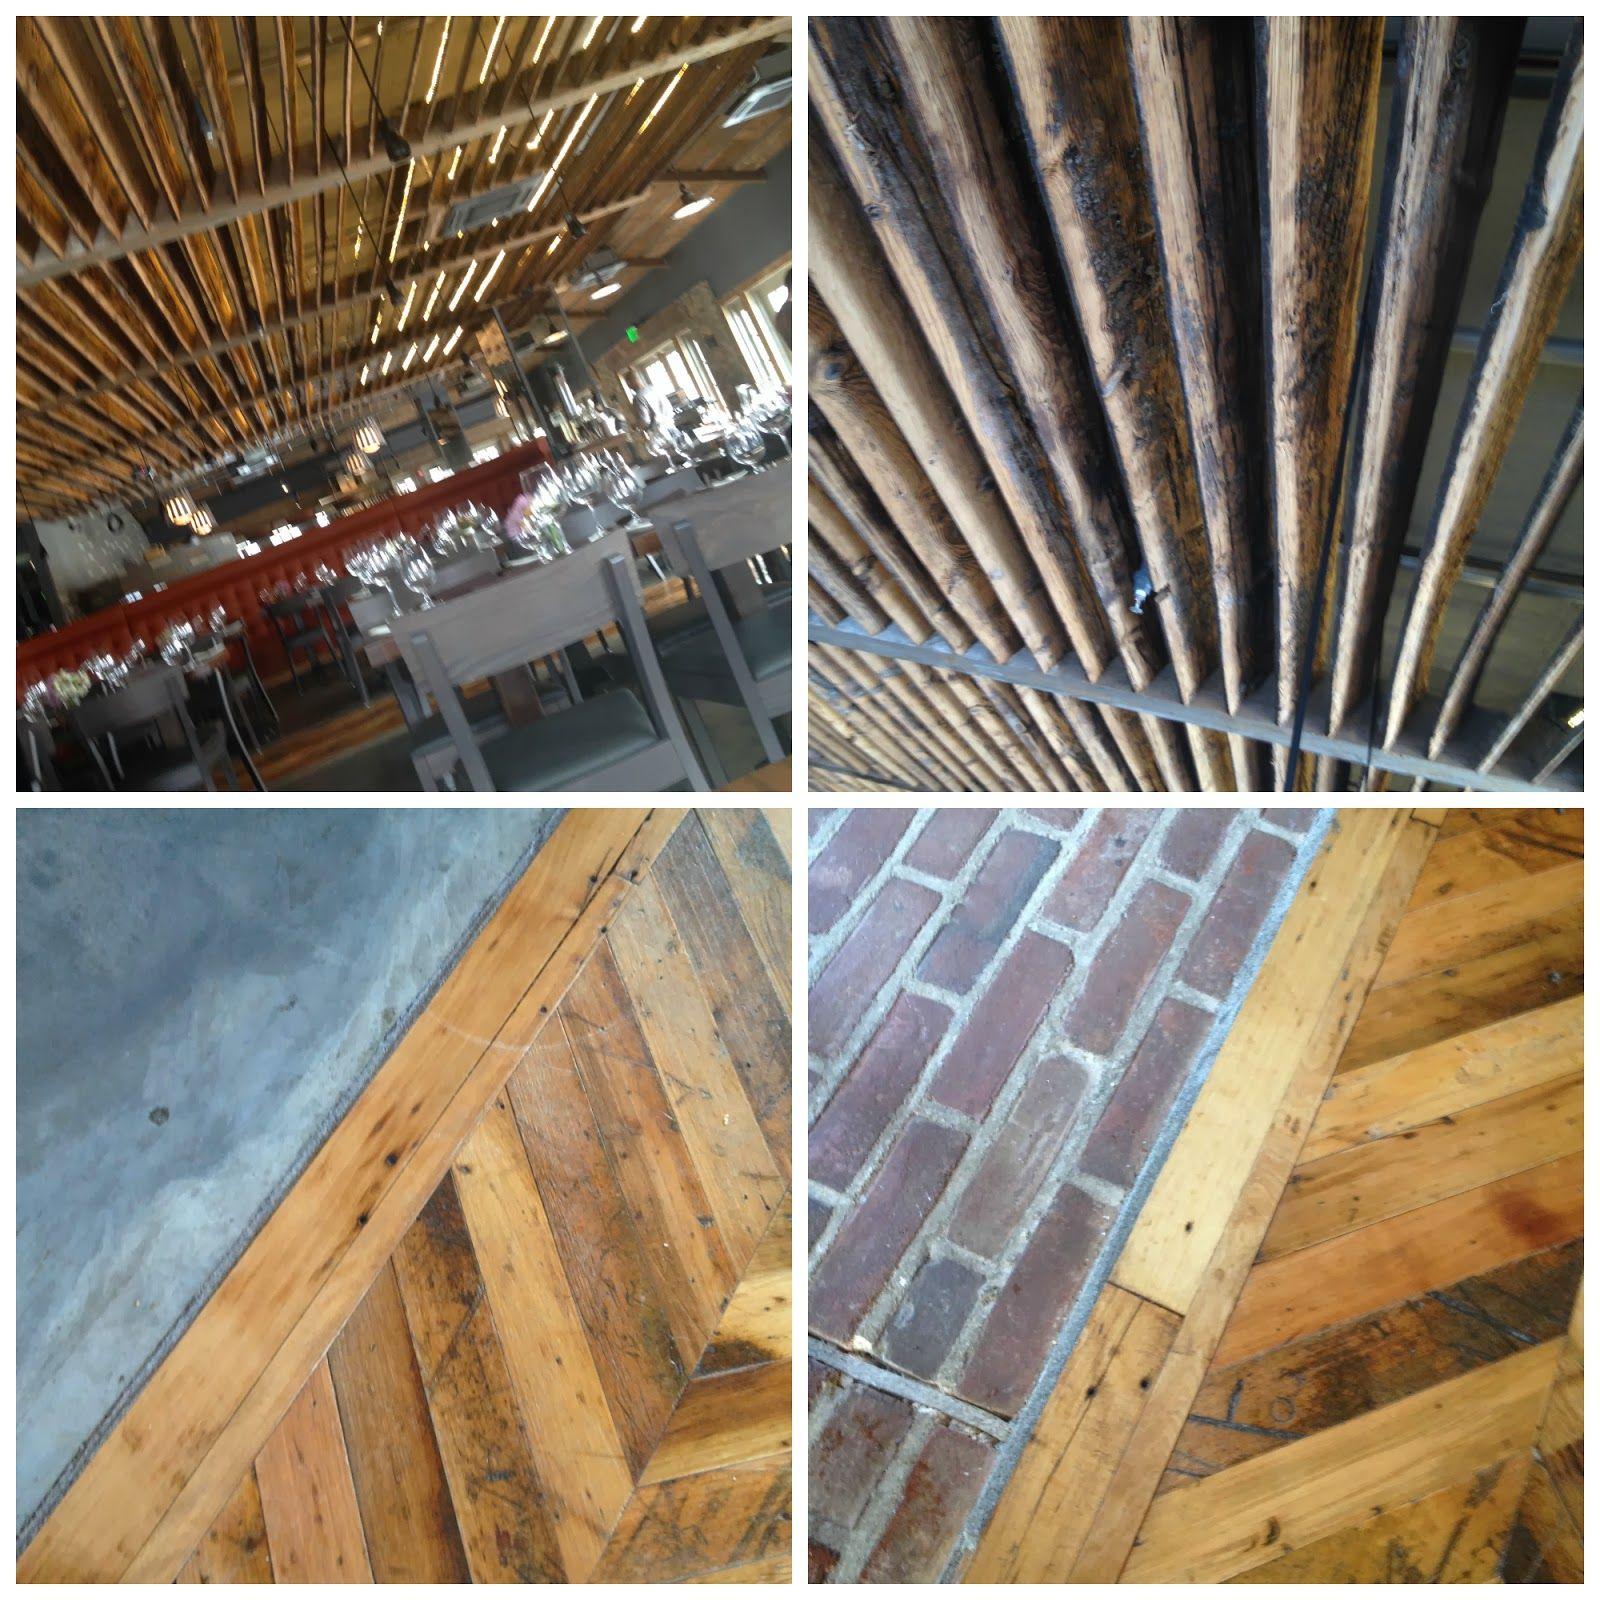 Rivermarket Wood Slatted Ceiling Marked With Mushrooms From Mushroom Growing Crates Wood Slat Ceiling Wood Slats Restaurant Design